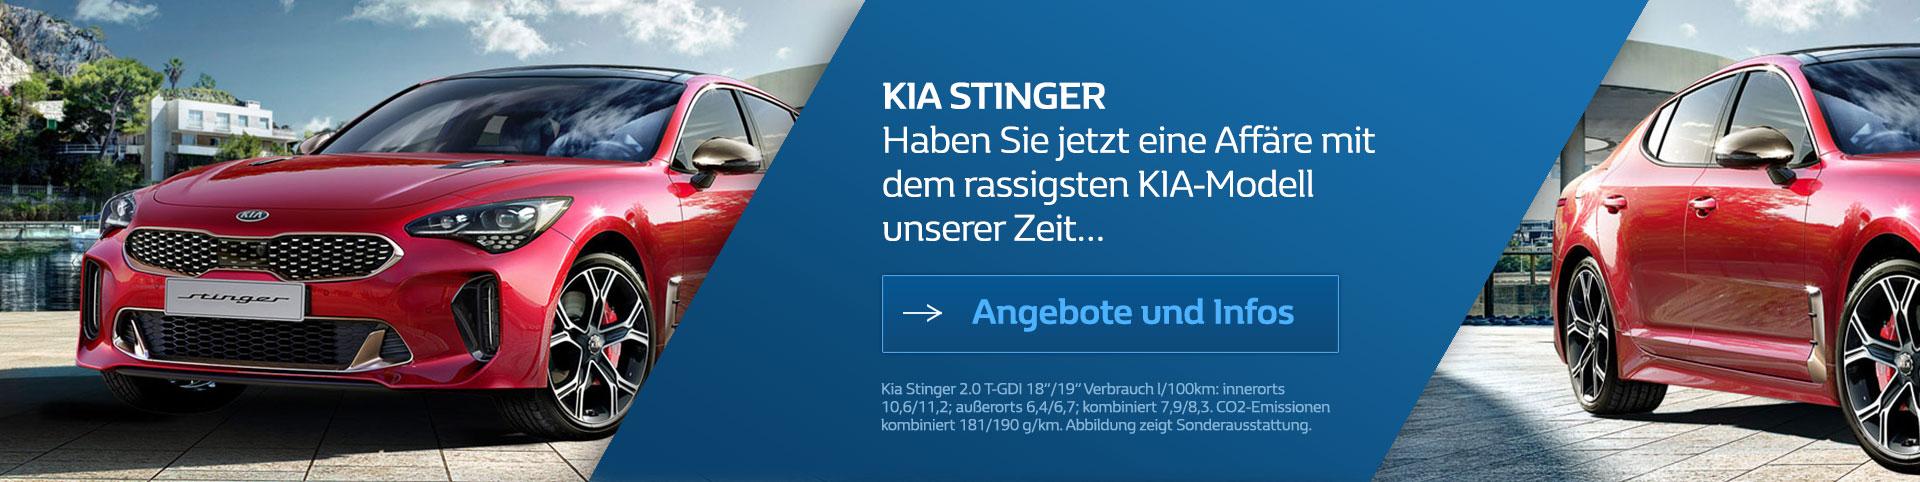 KIA Stinger 2017 vom Autozentrum P&A